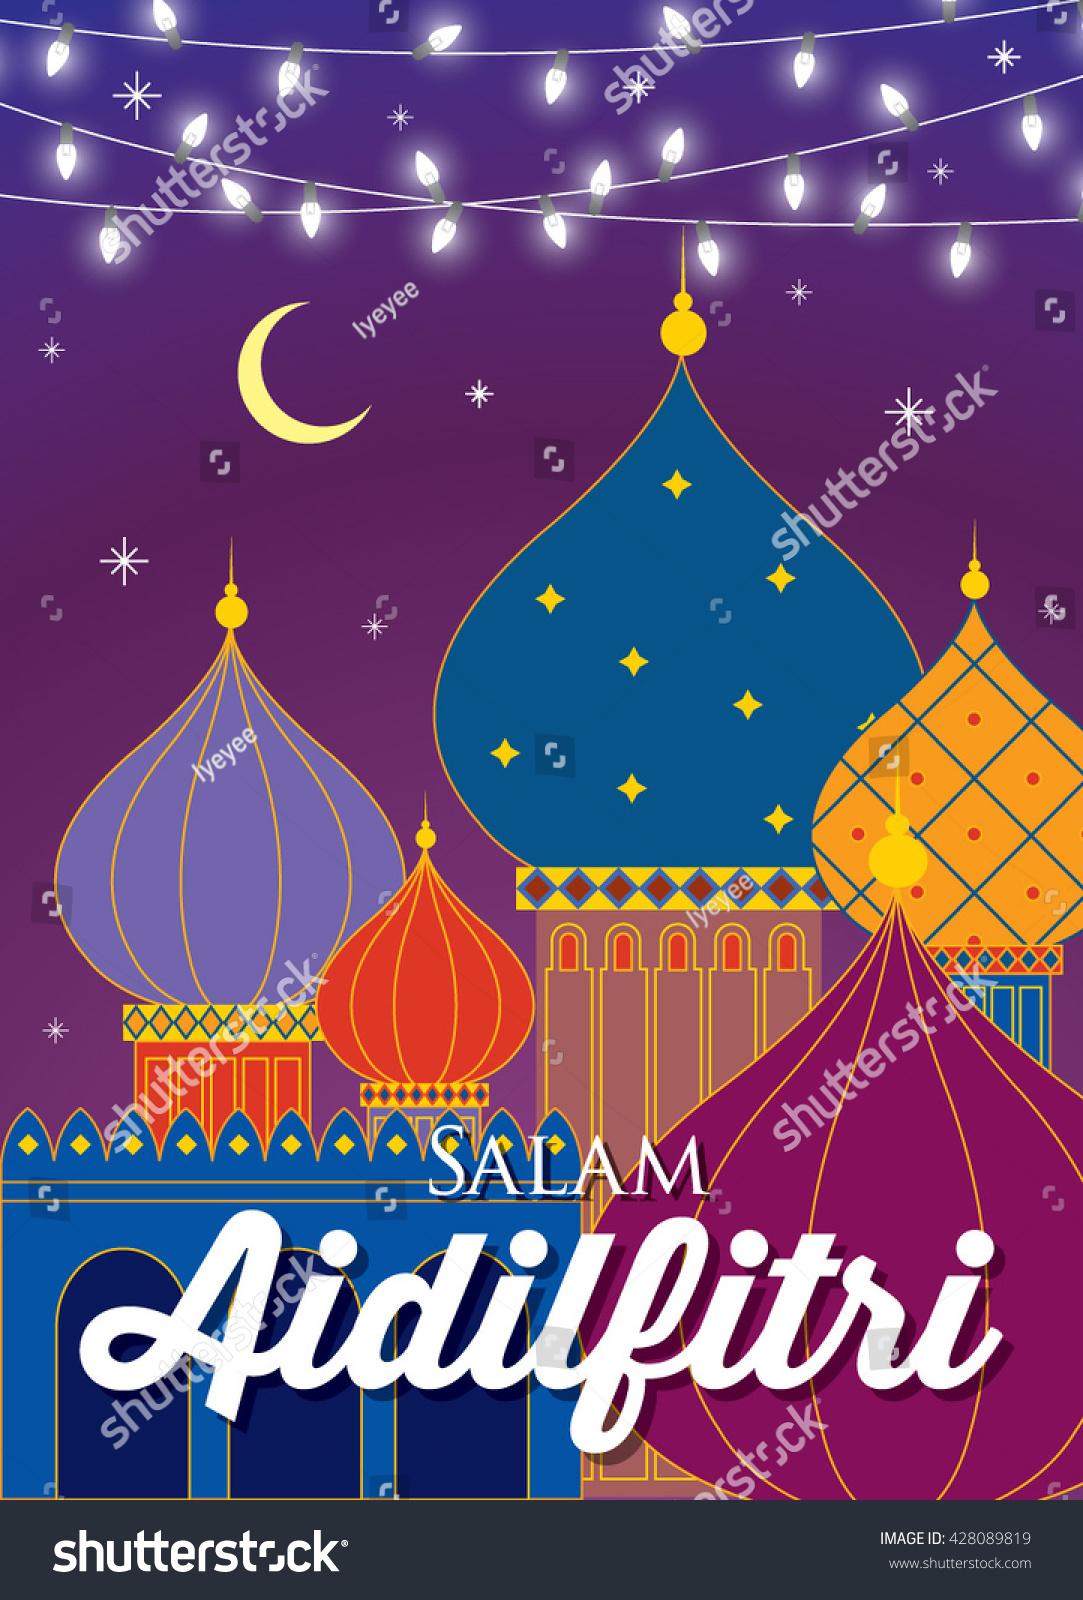 Eid greetings words image collections greeting card examples hari raya eid mubarak mosque template stock vector 428089819 hari raya eid mubarak mosque template with kristyandbryce Image collections